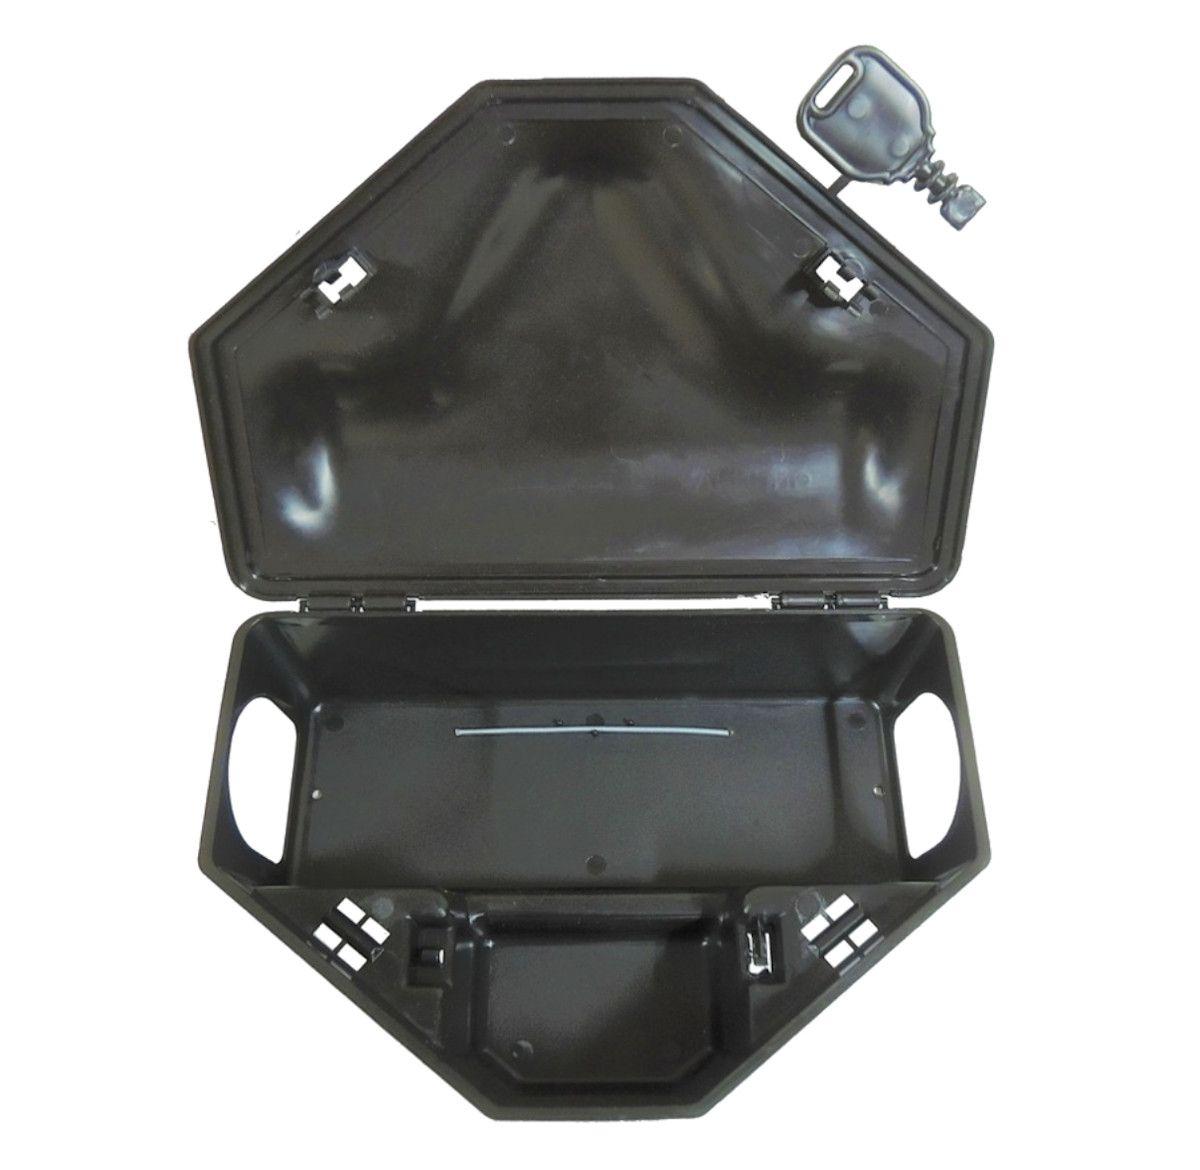 KIT 60 Porta Iscas Resistentes 2 TRAVAS c/ Chave Mata Ratos